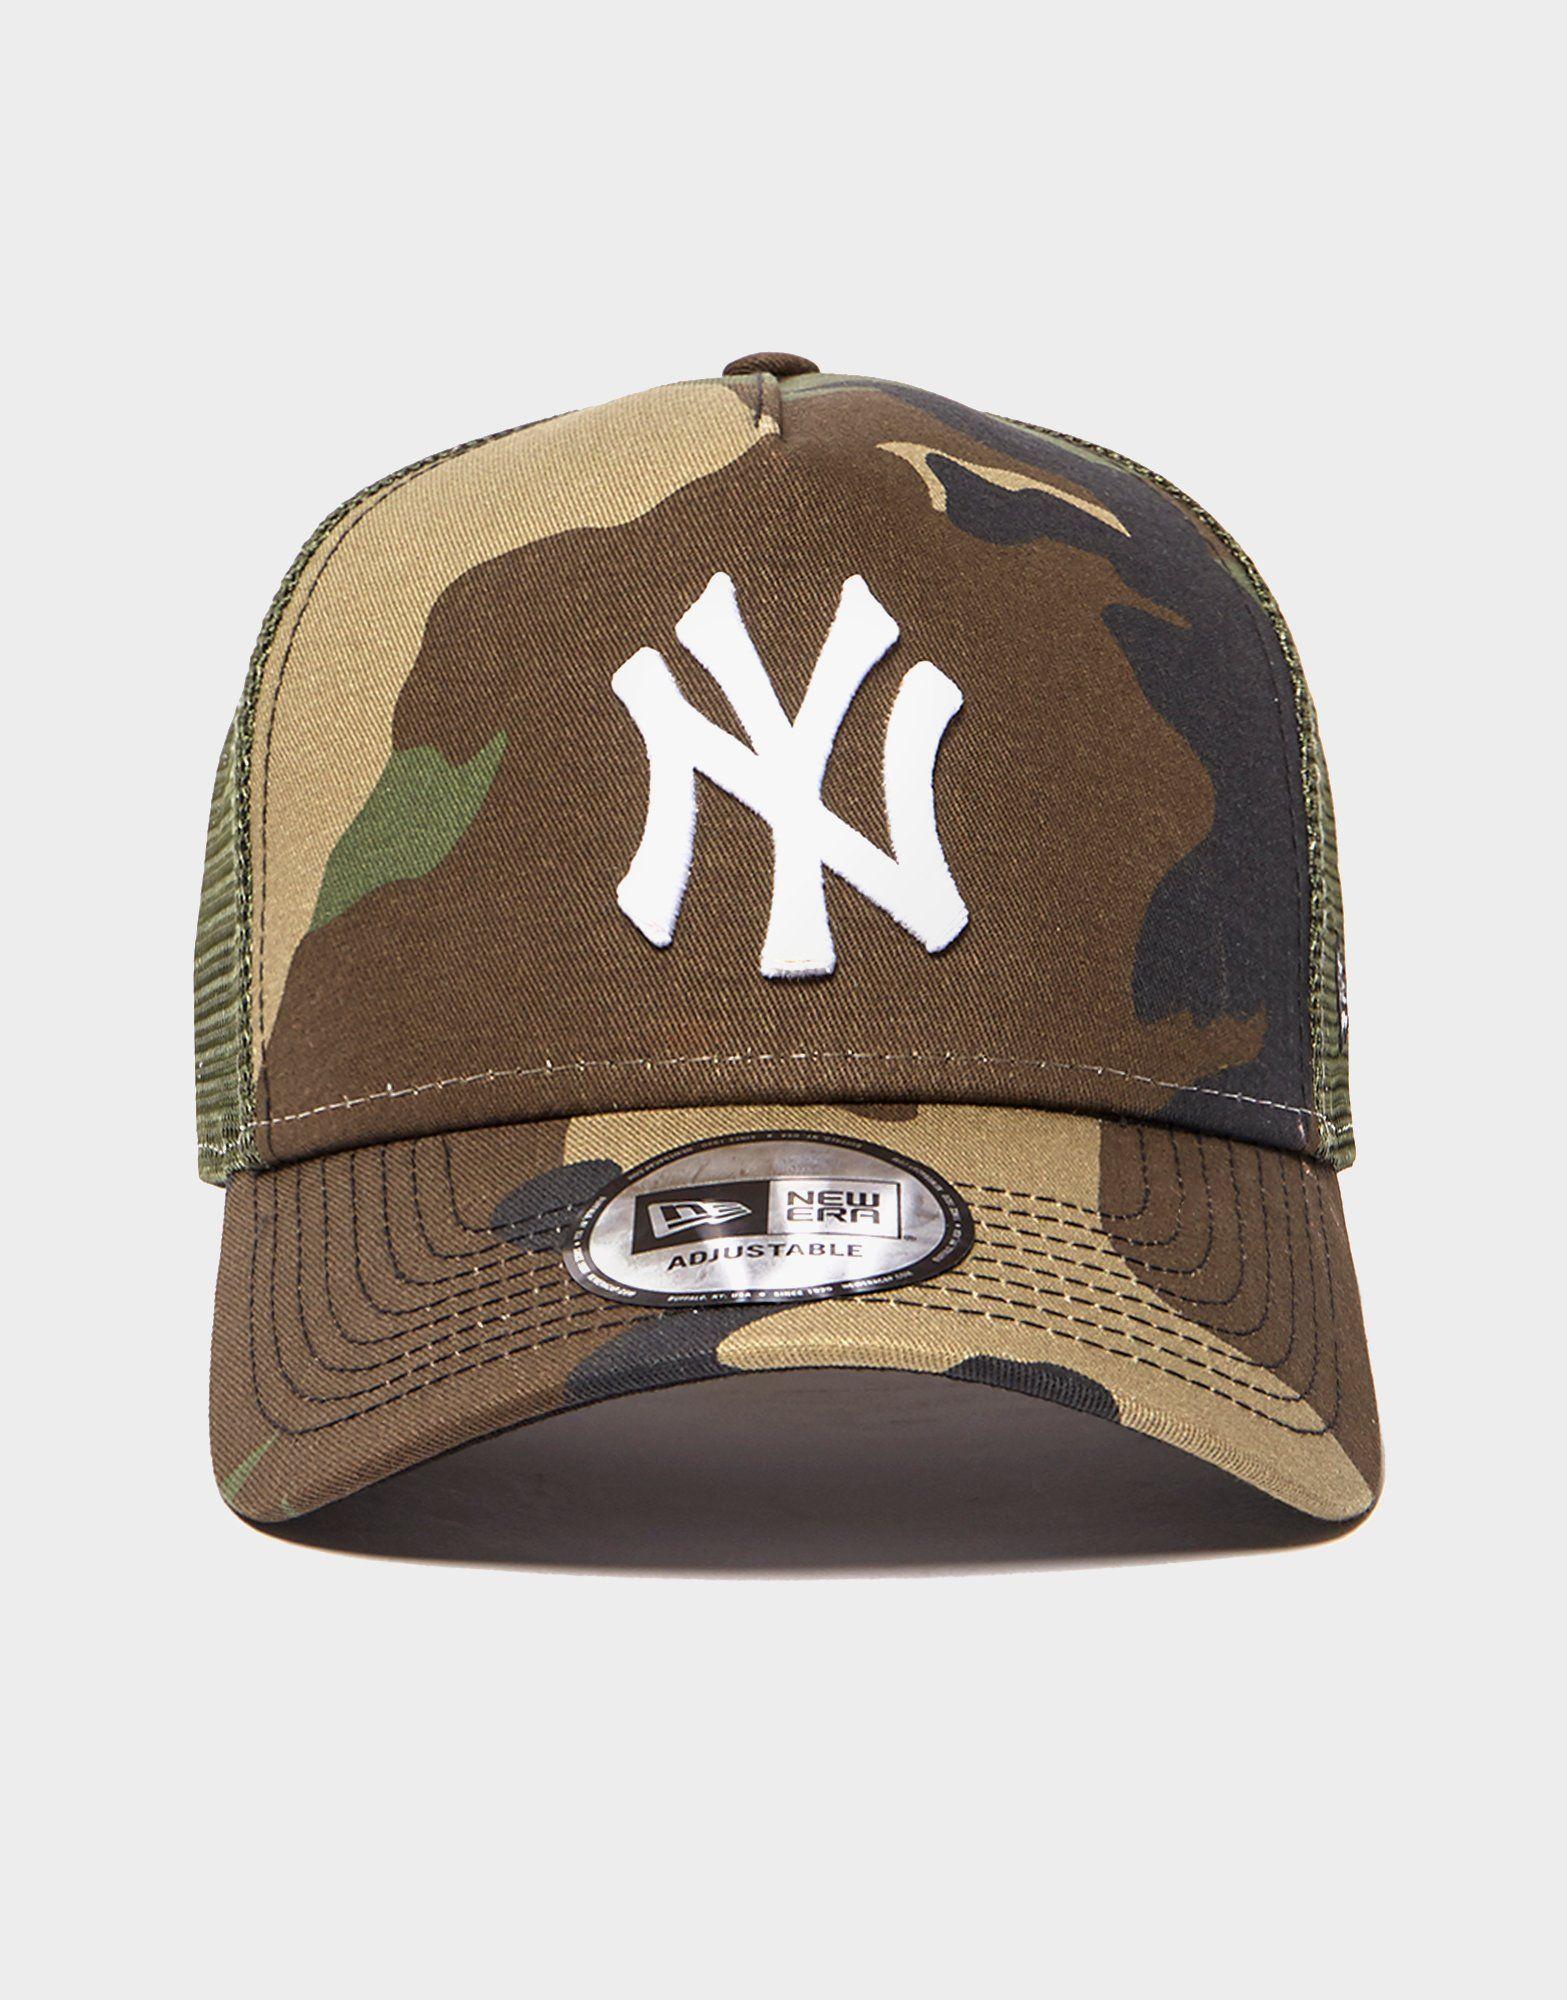 7692ff9f81af1e 2 Reviews · New Era MLB New York Yankees Snapback Trucker Cap .